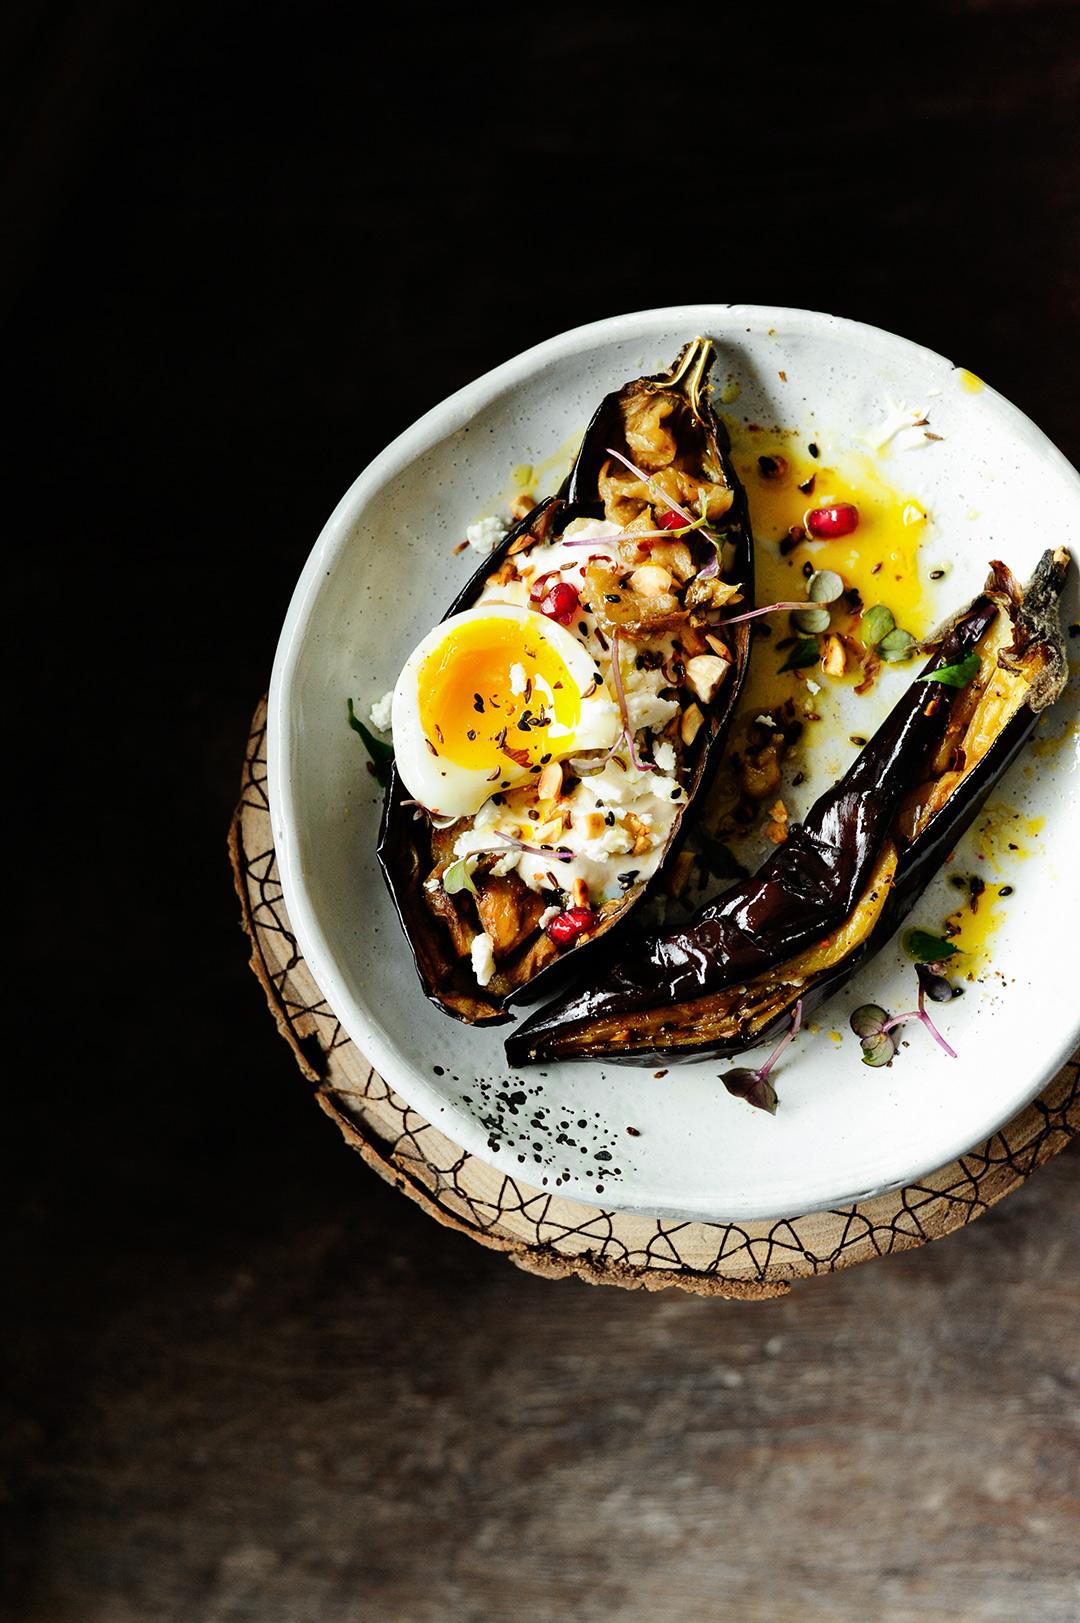 serving dumplings | Roasted aubergine with tahini dressing and hazelnuts